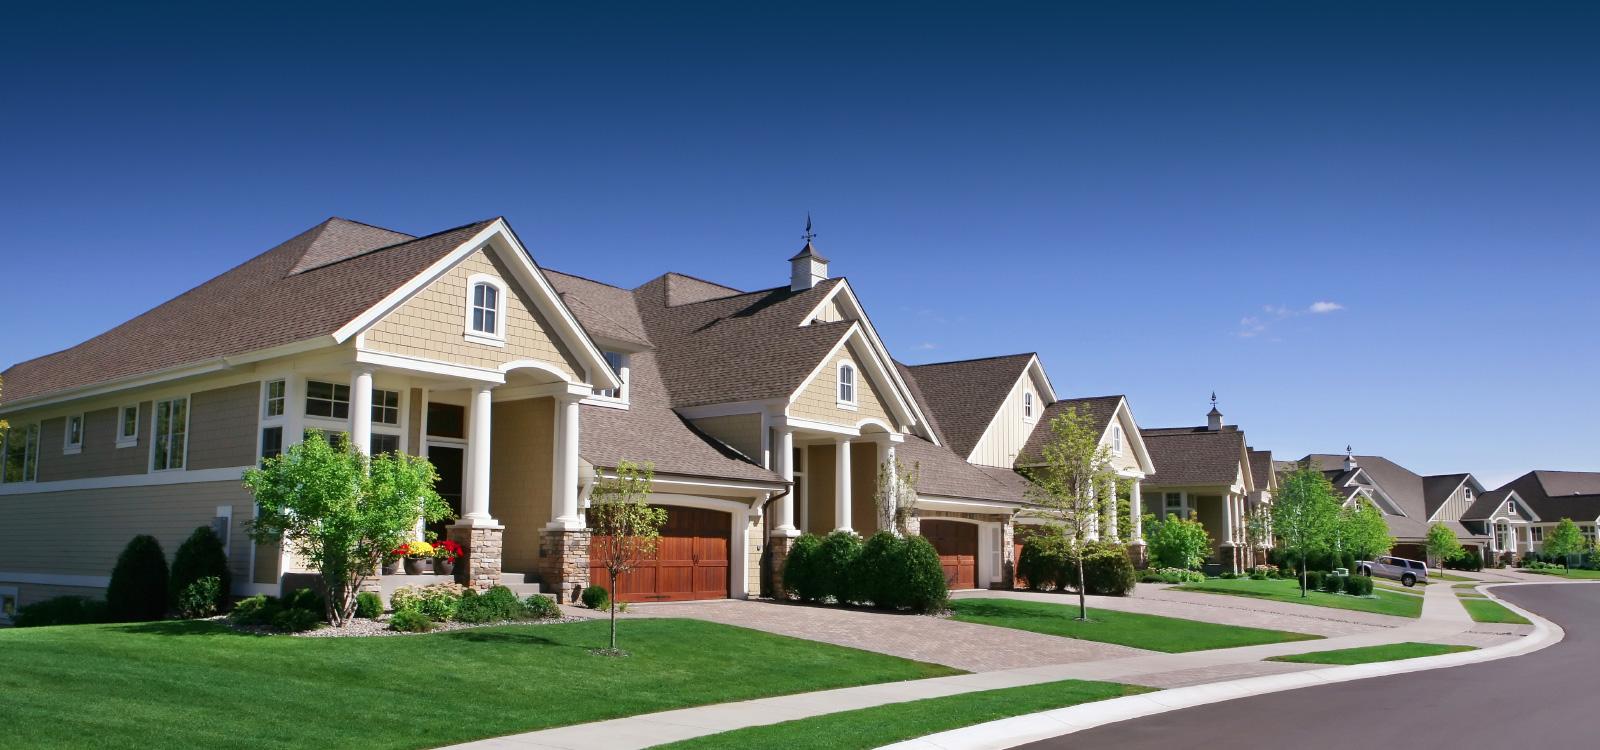 Home Inspection Checklist Tacoma